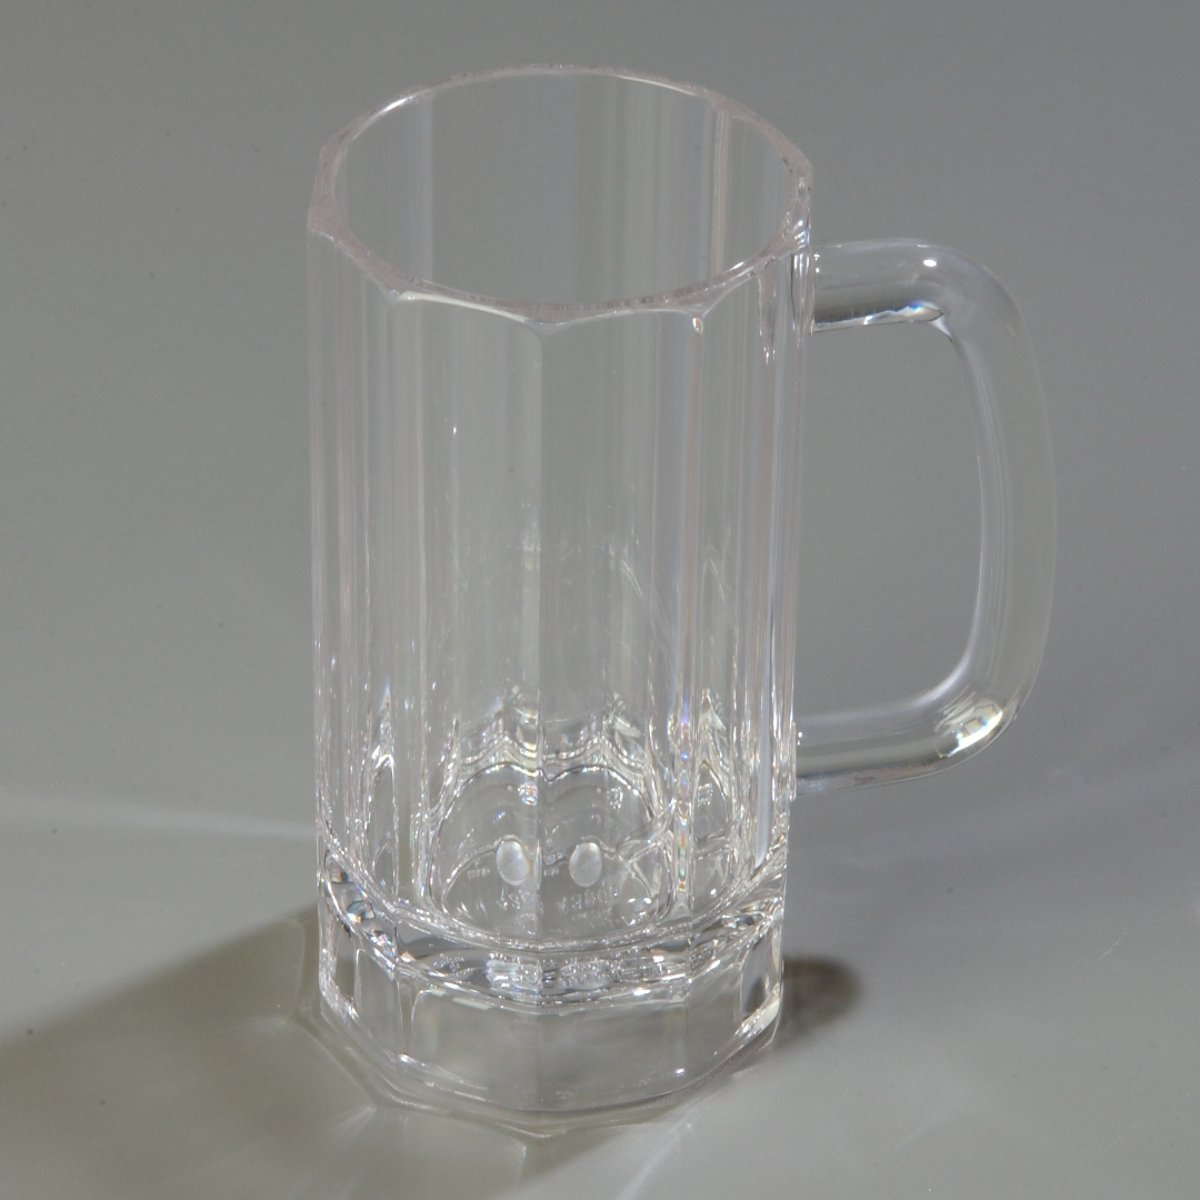 Carlisle 4396507 Lexington PC Mug, 16 oz, 6.23''Height, 5.02''Width, 5.02''Length, Polycarbonate (PC) Clear (Pack of 12)